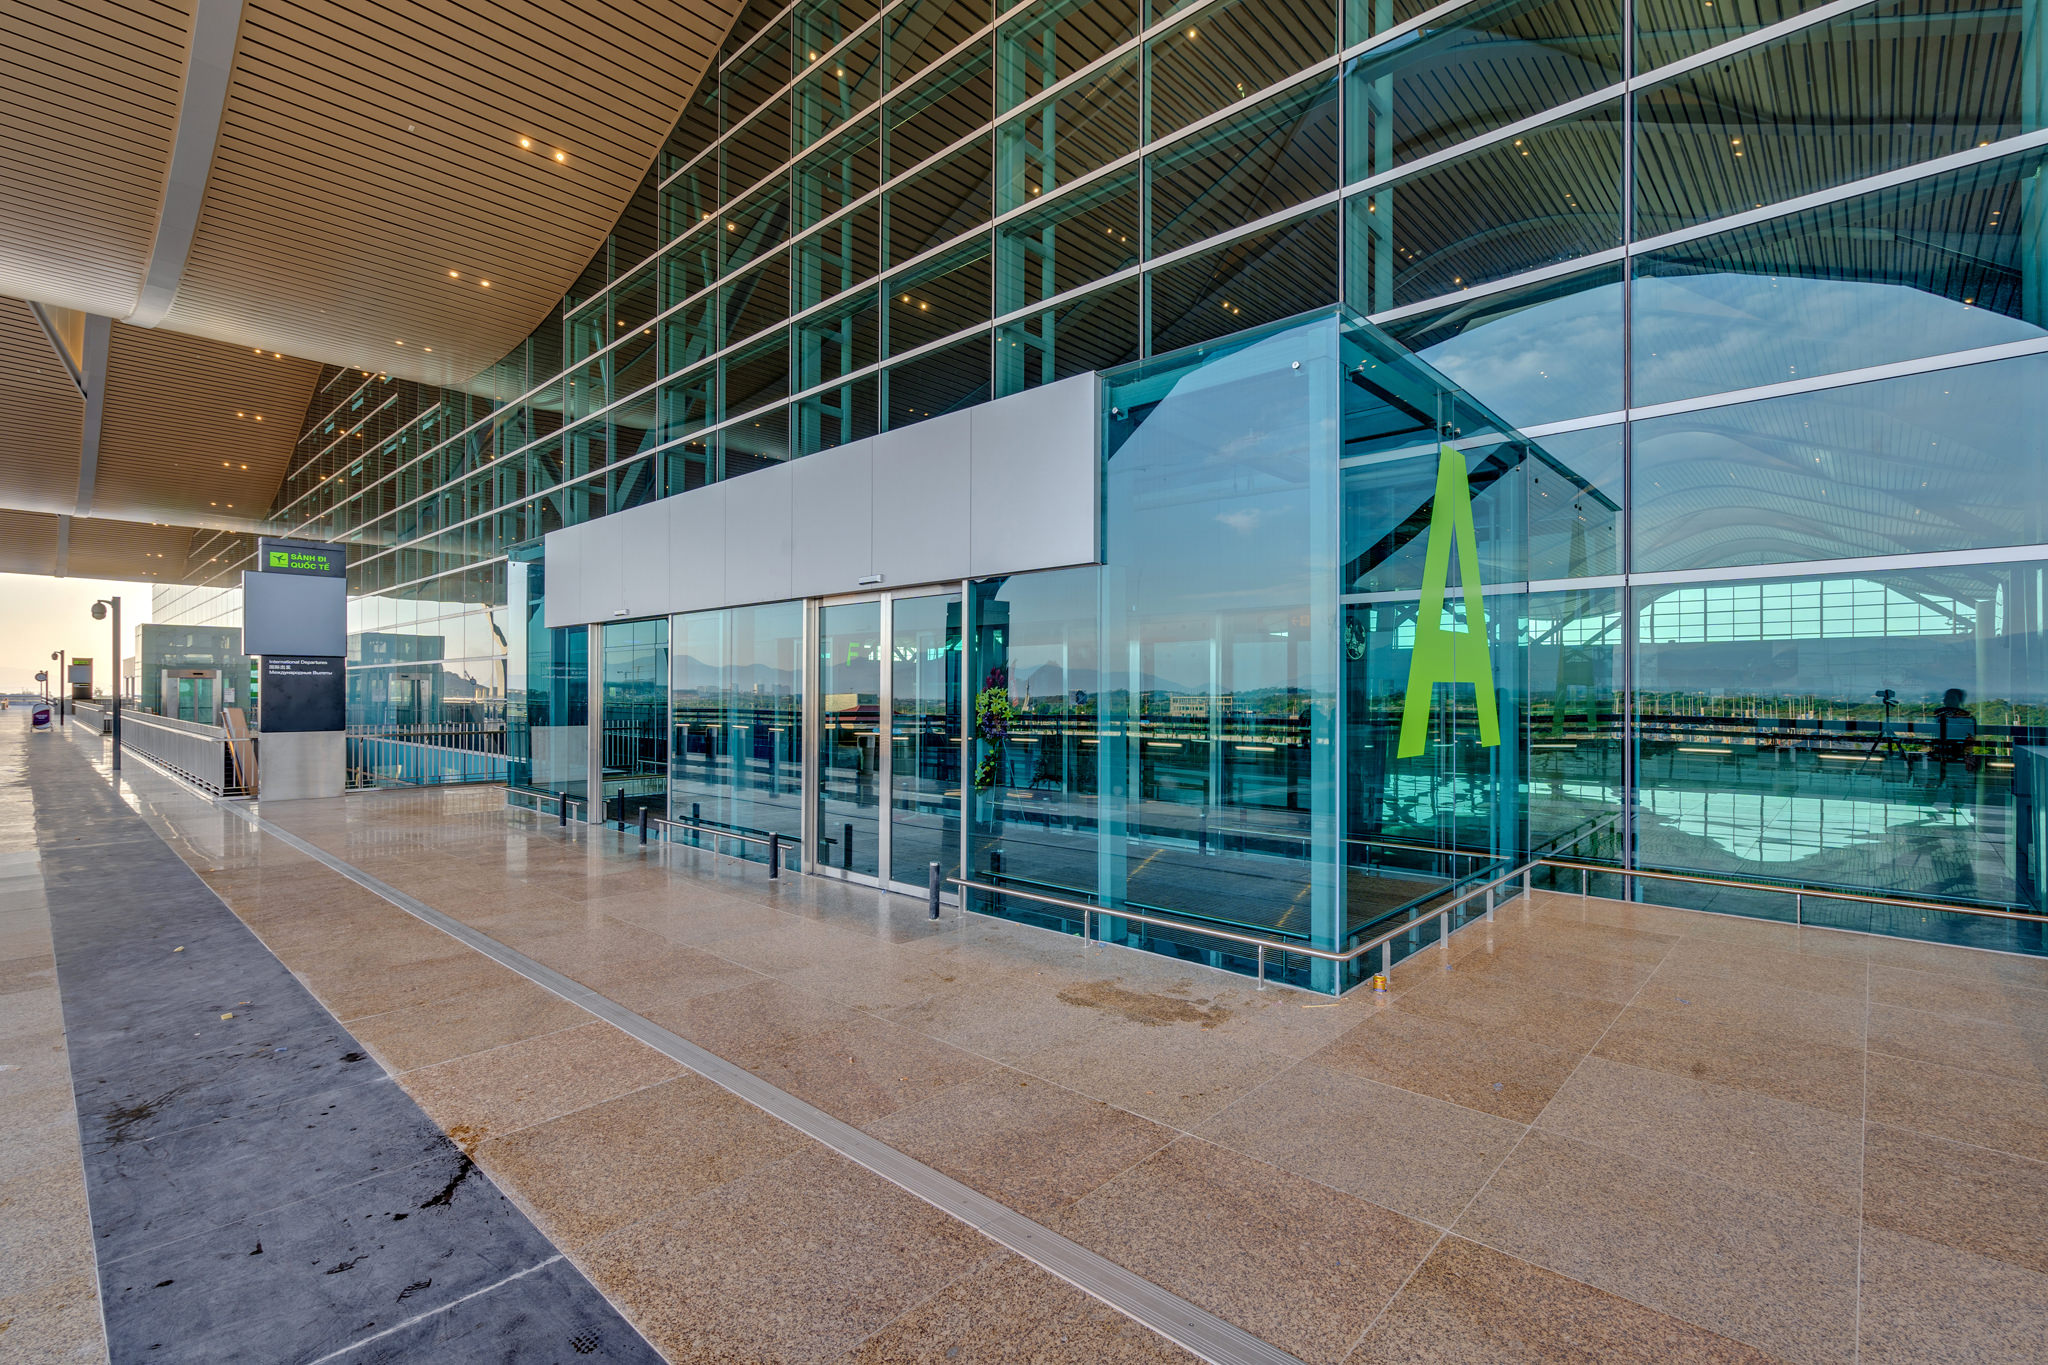 20180626 - Cam Ranh Airport - Architecture - 0068.jpg